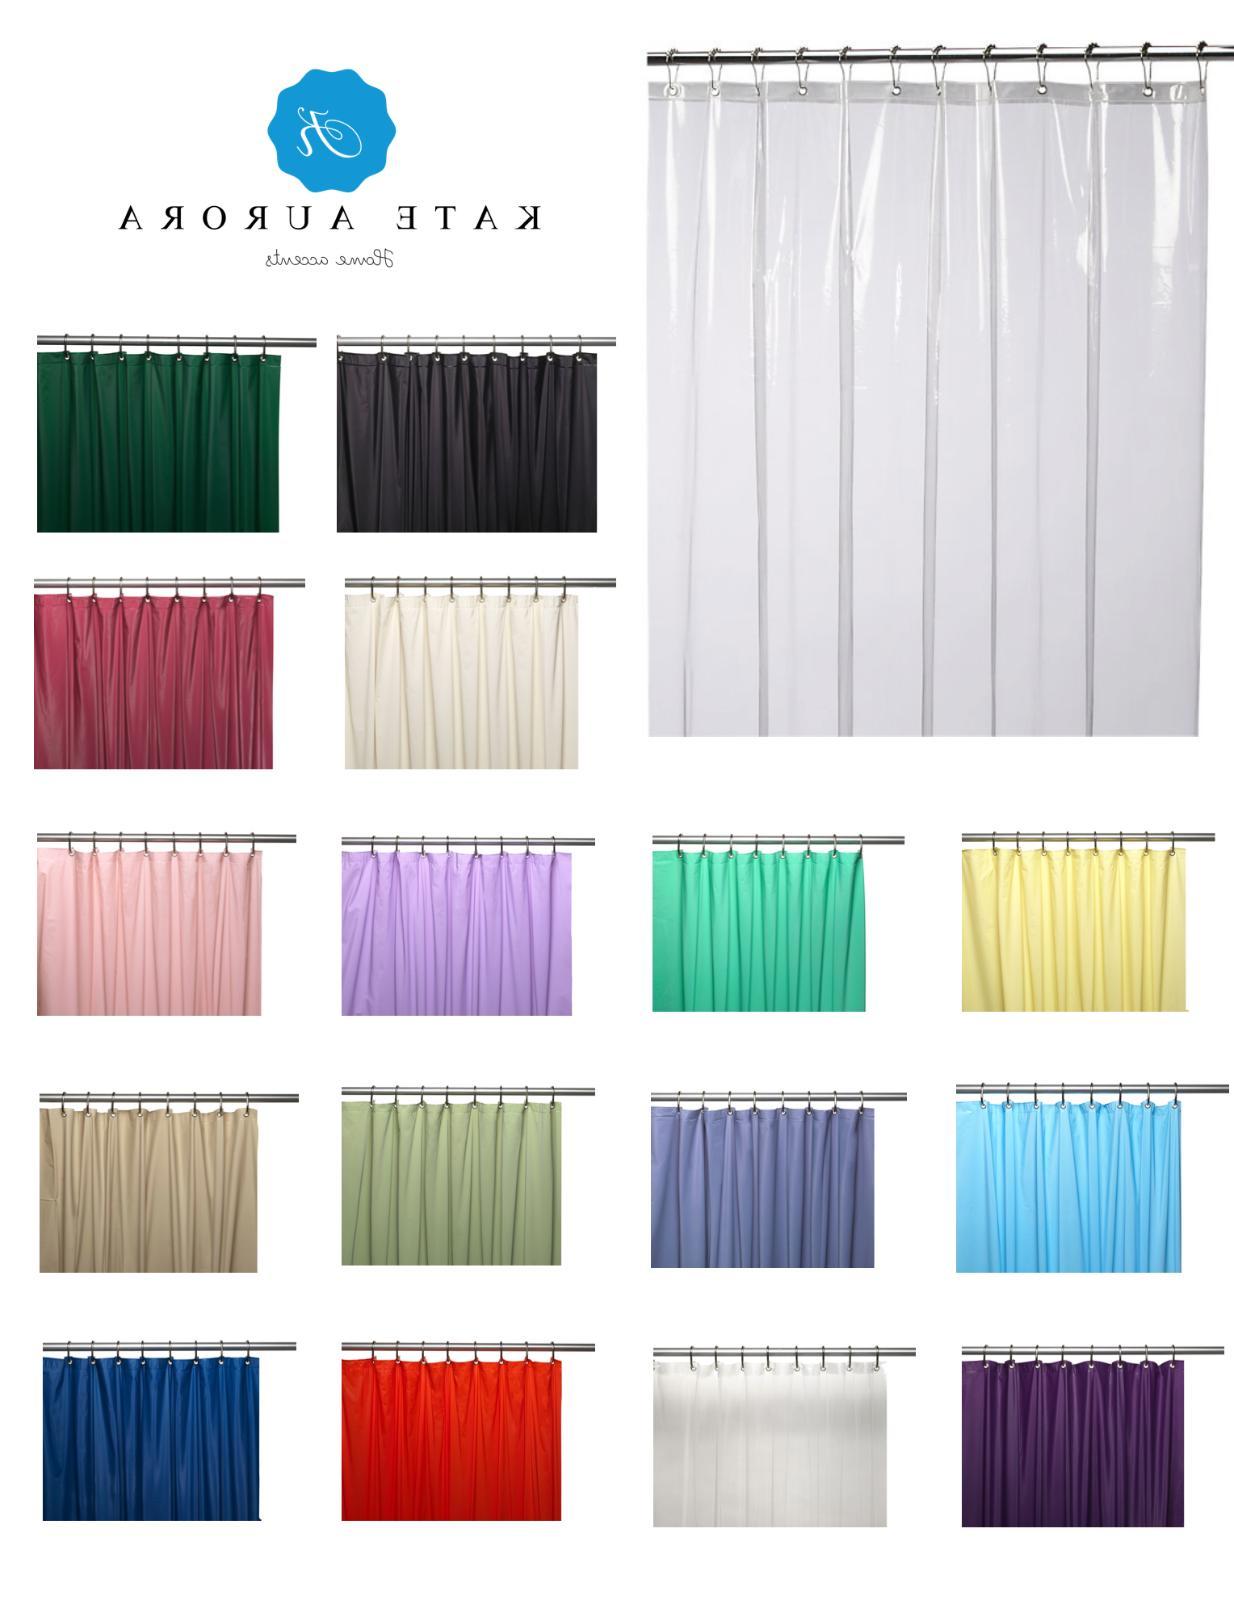 heavy duty 10 gauge vinyl shower curtain